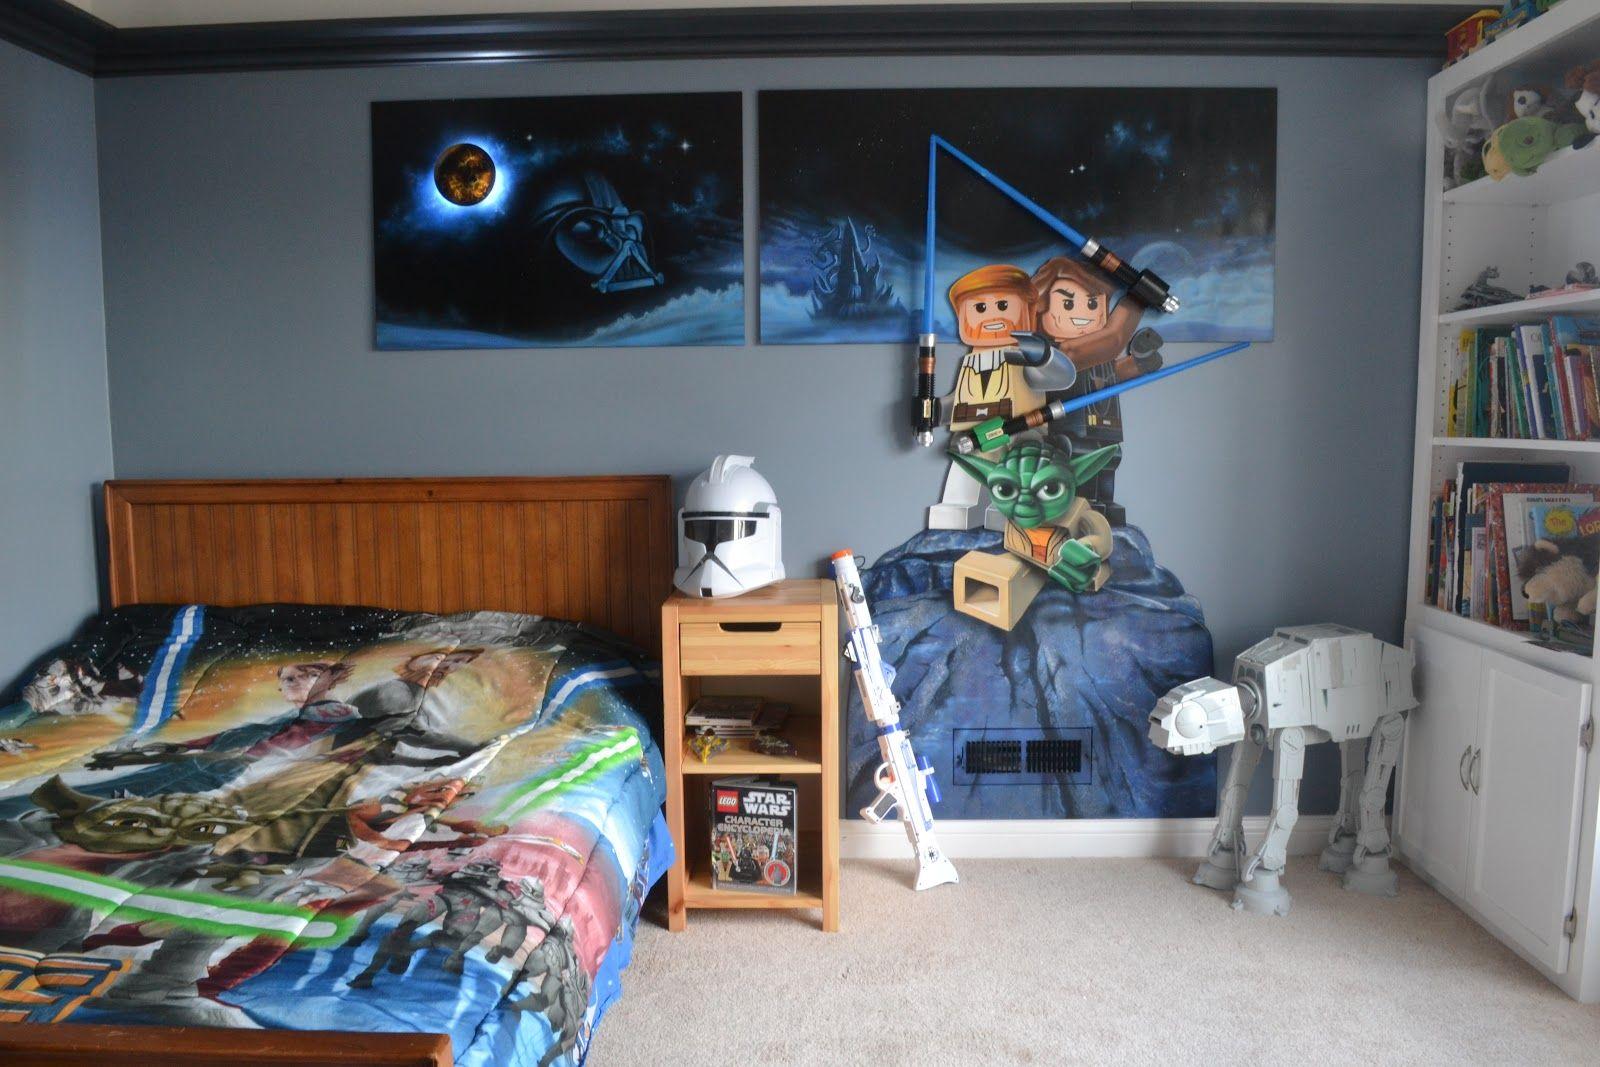 45 Best Star Wars Room Decor In 2020 Star Wars Room Decor Star